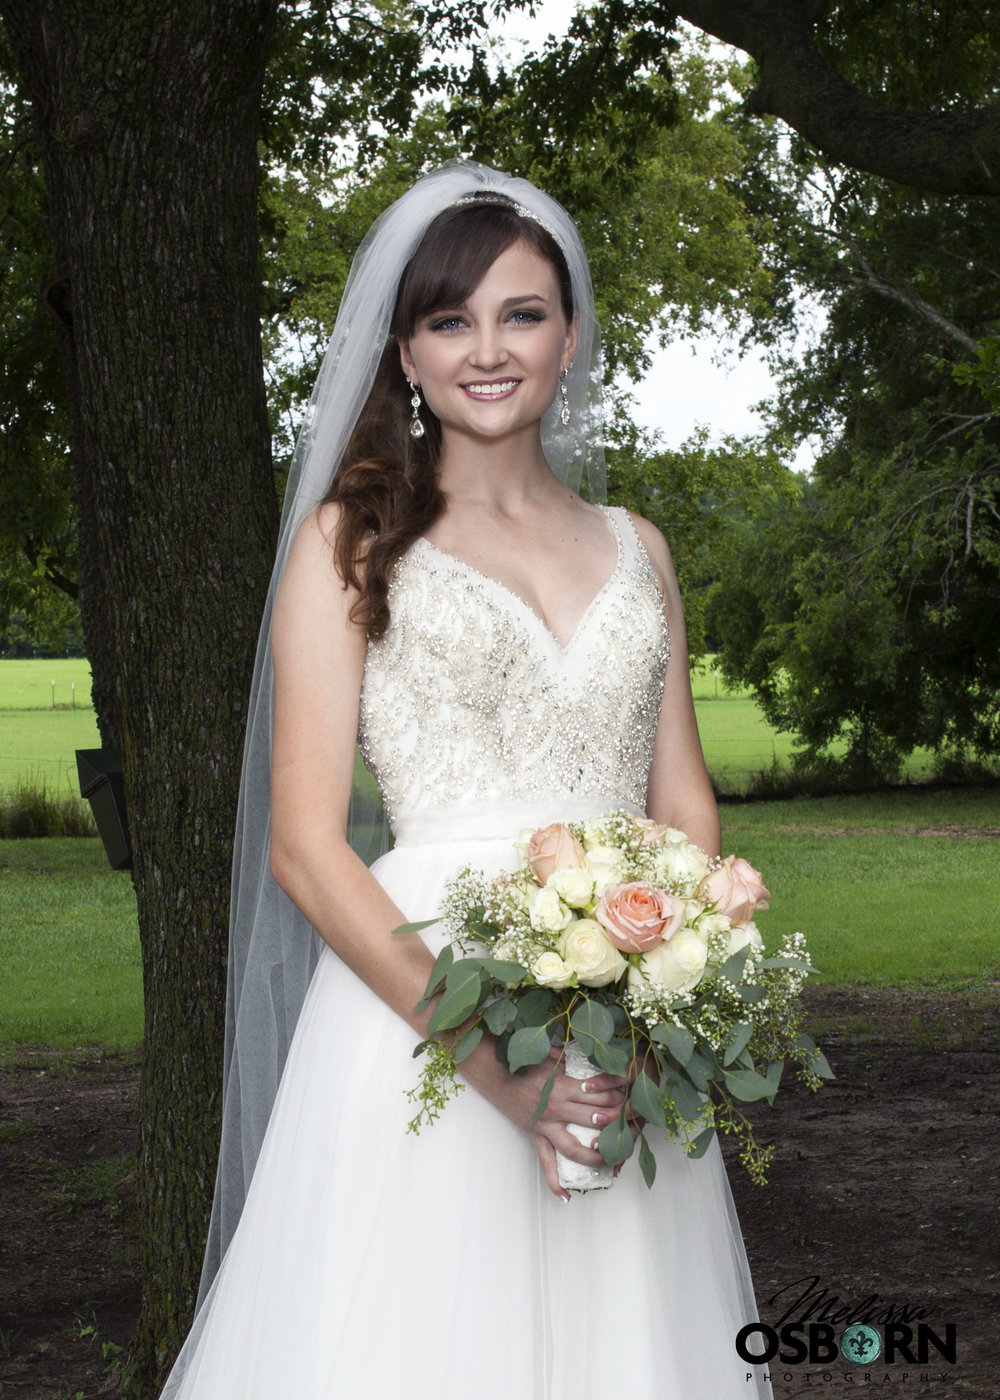 A stunning bride.